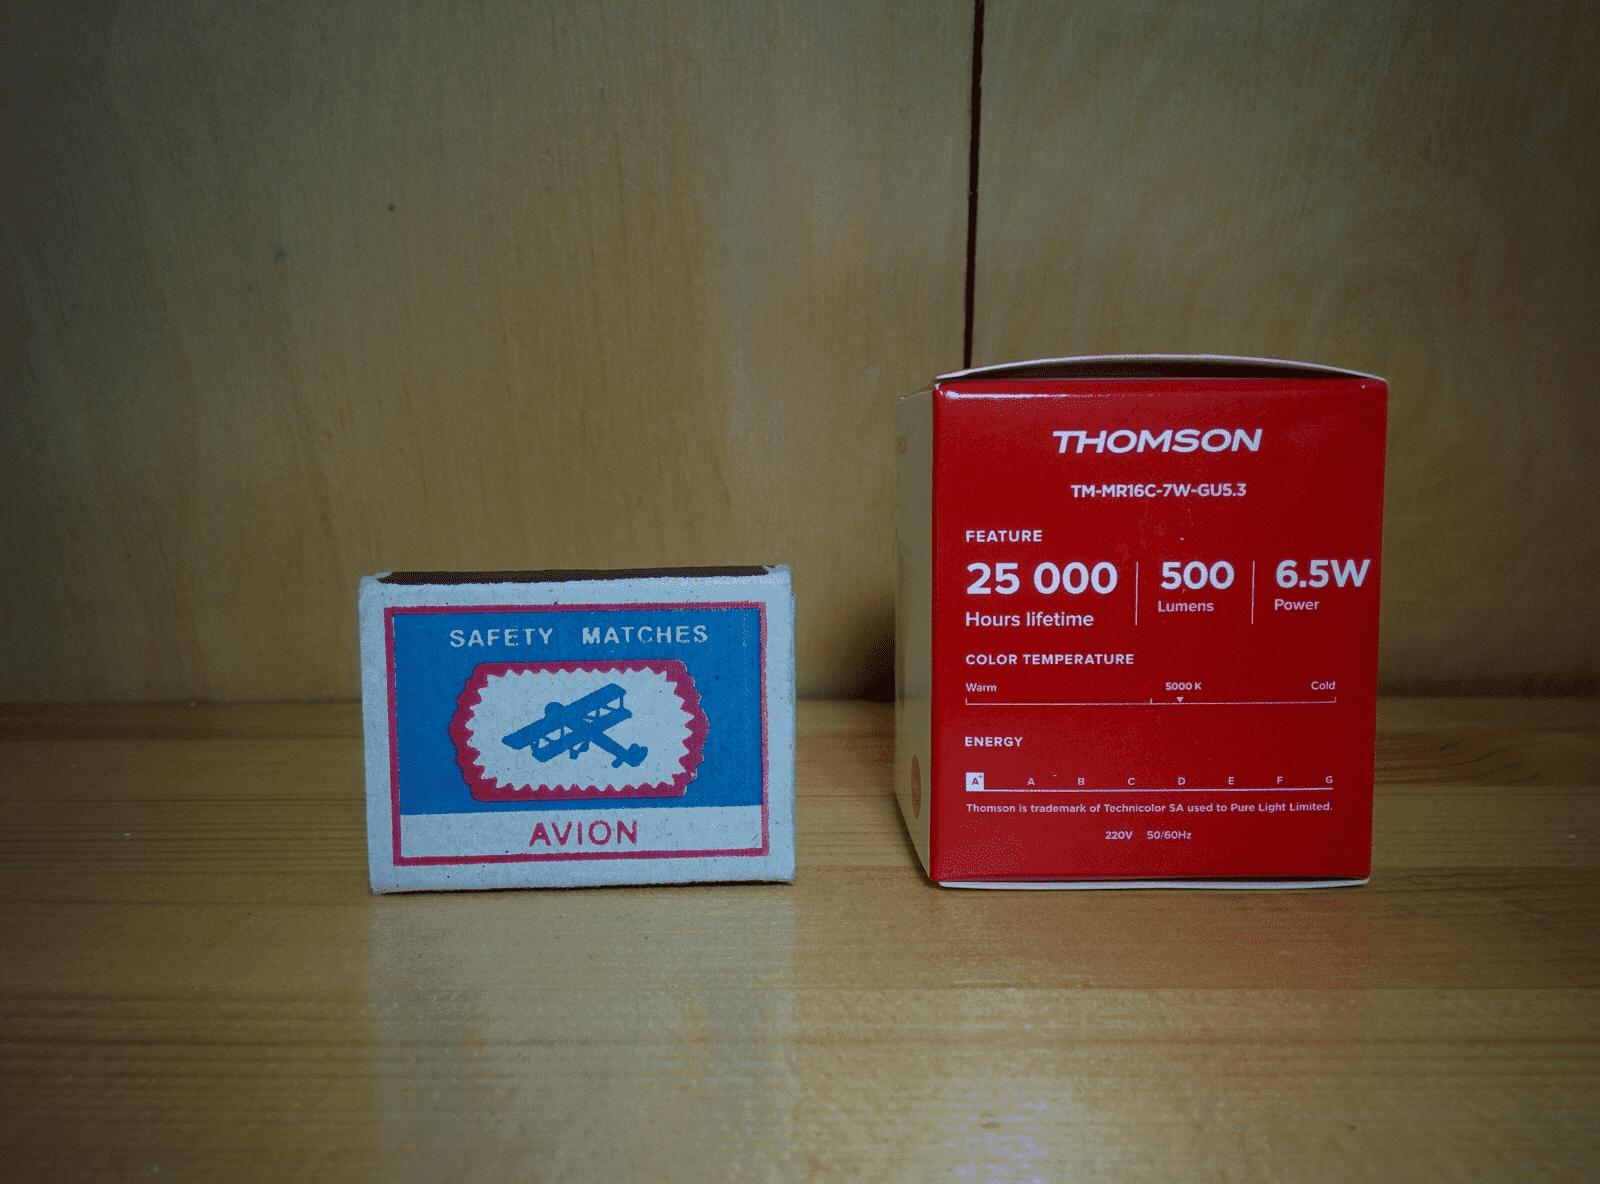 TM-MR16C-7W-GU5.3 характеристики